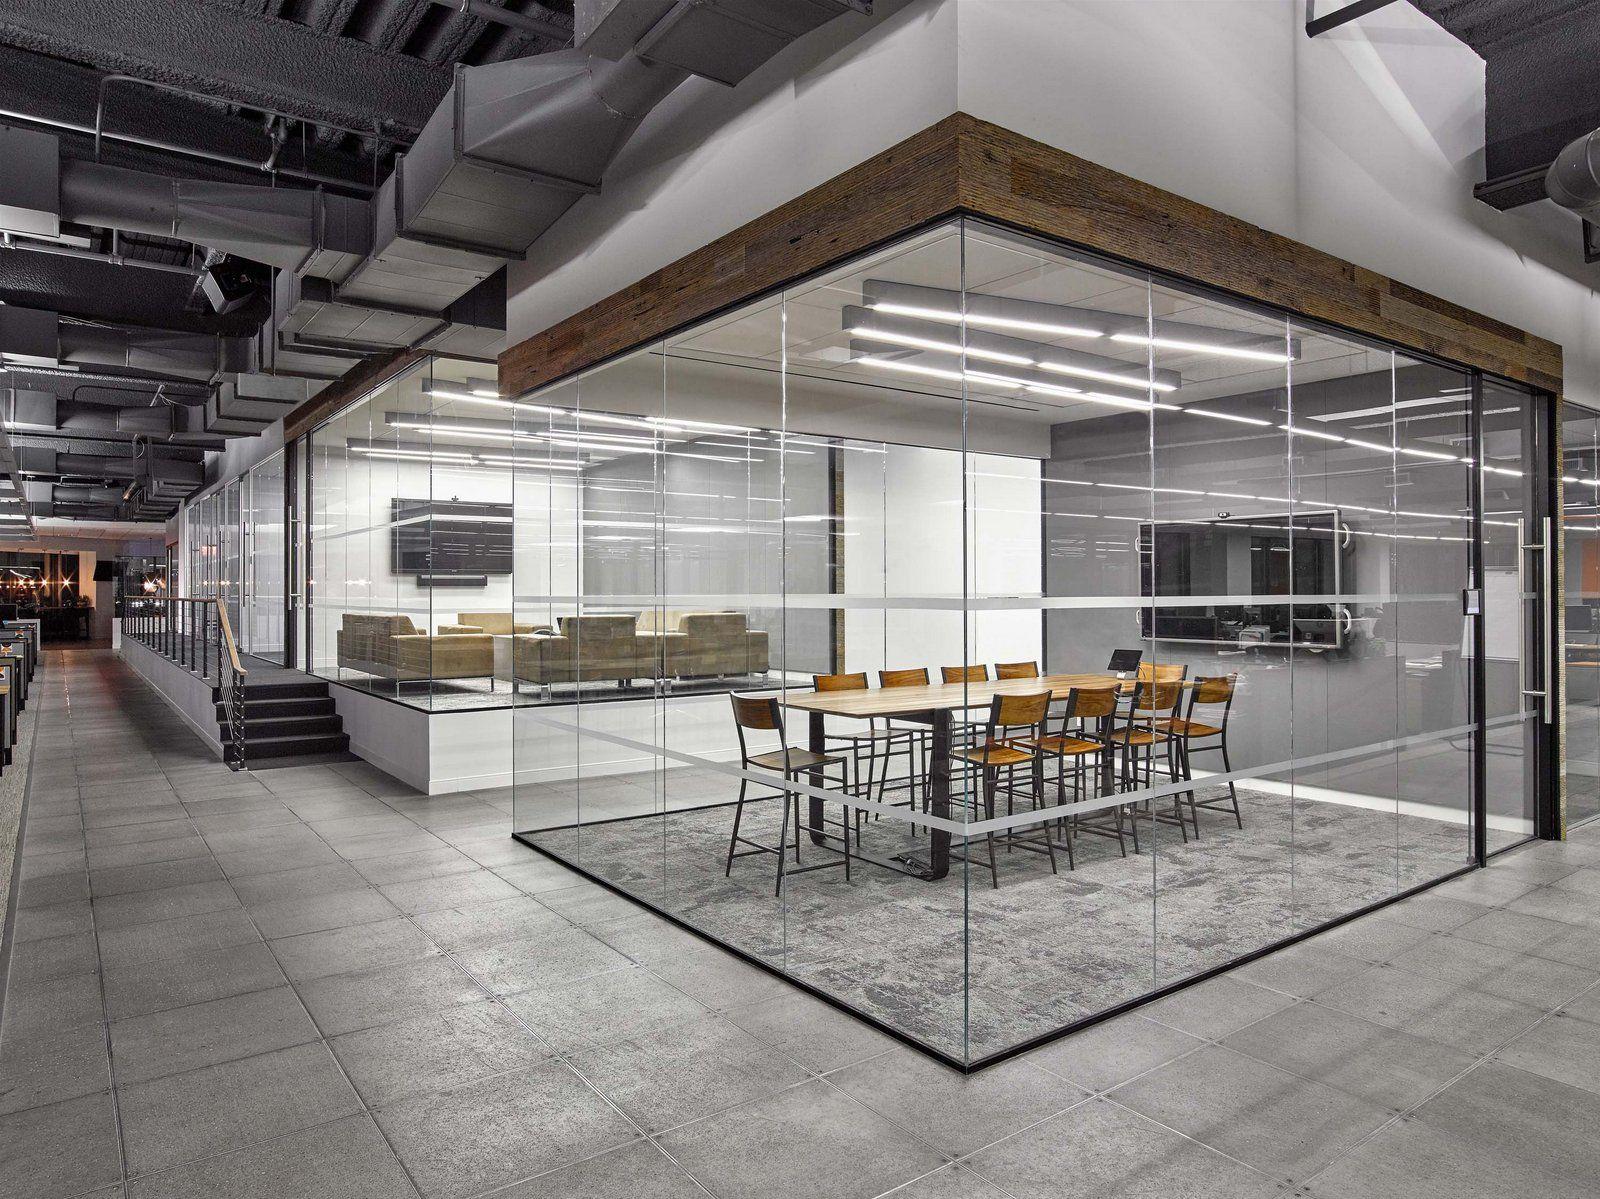 Office Renovation Ideas The Bloc Officefoz Design  Office Snapshots  Office